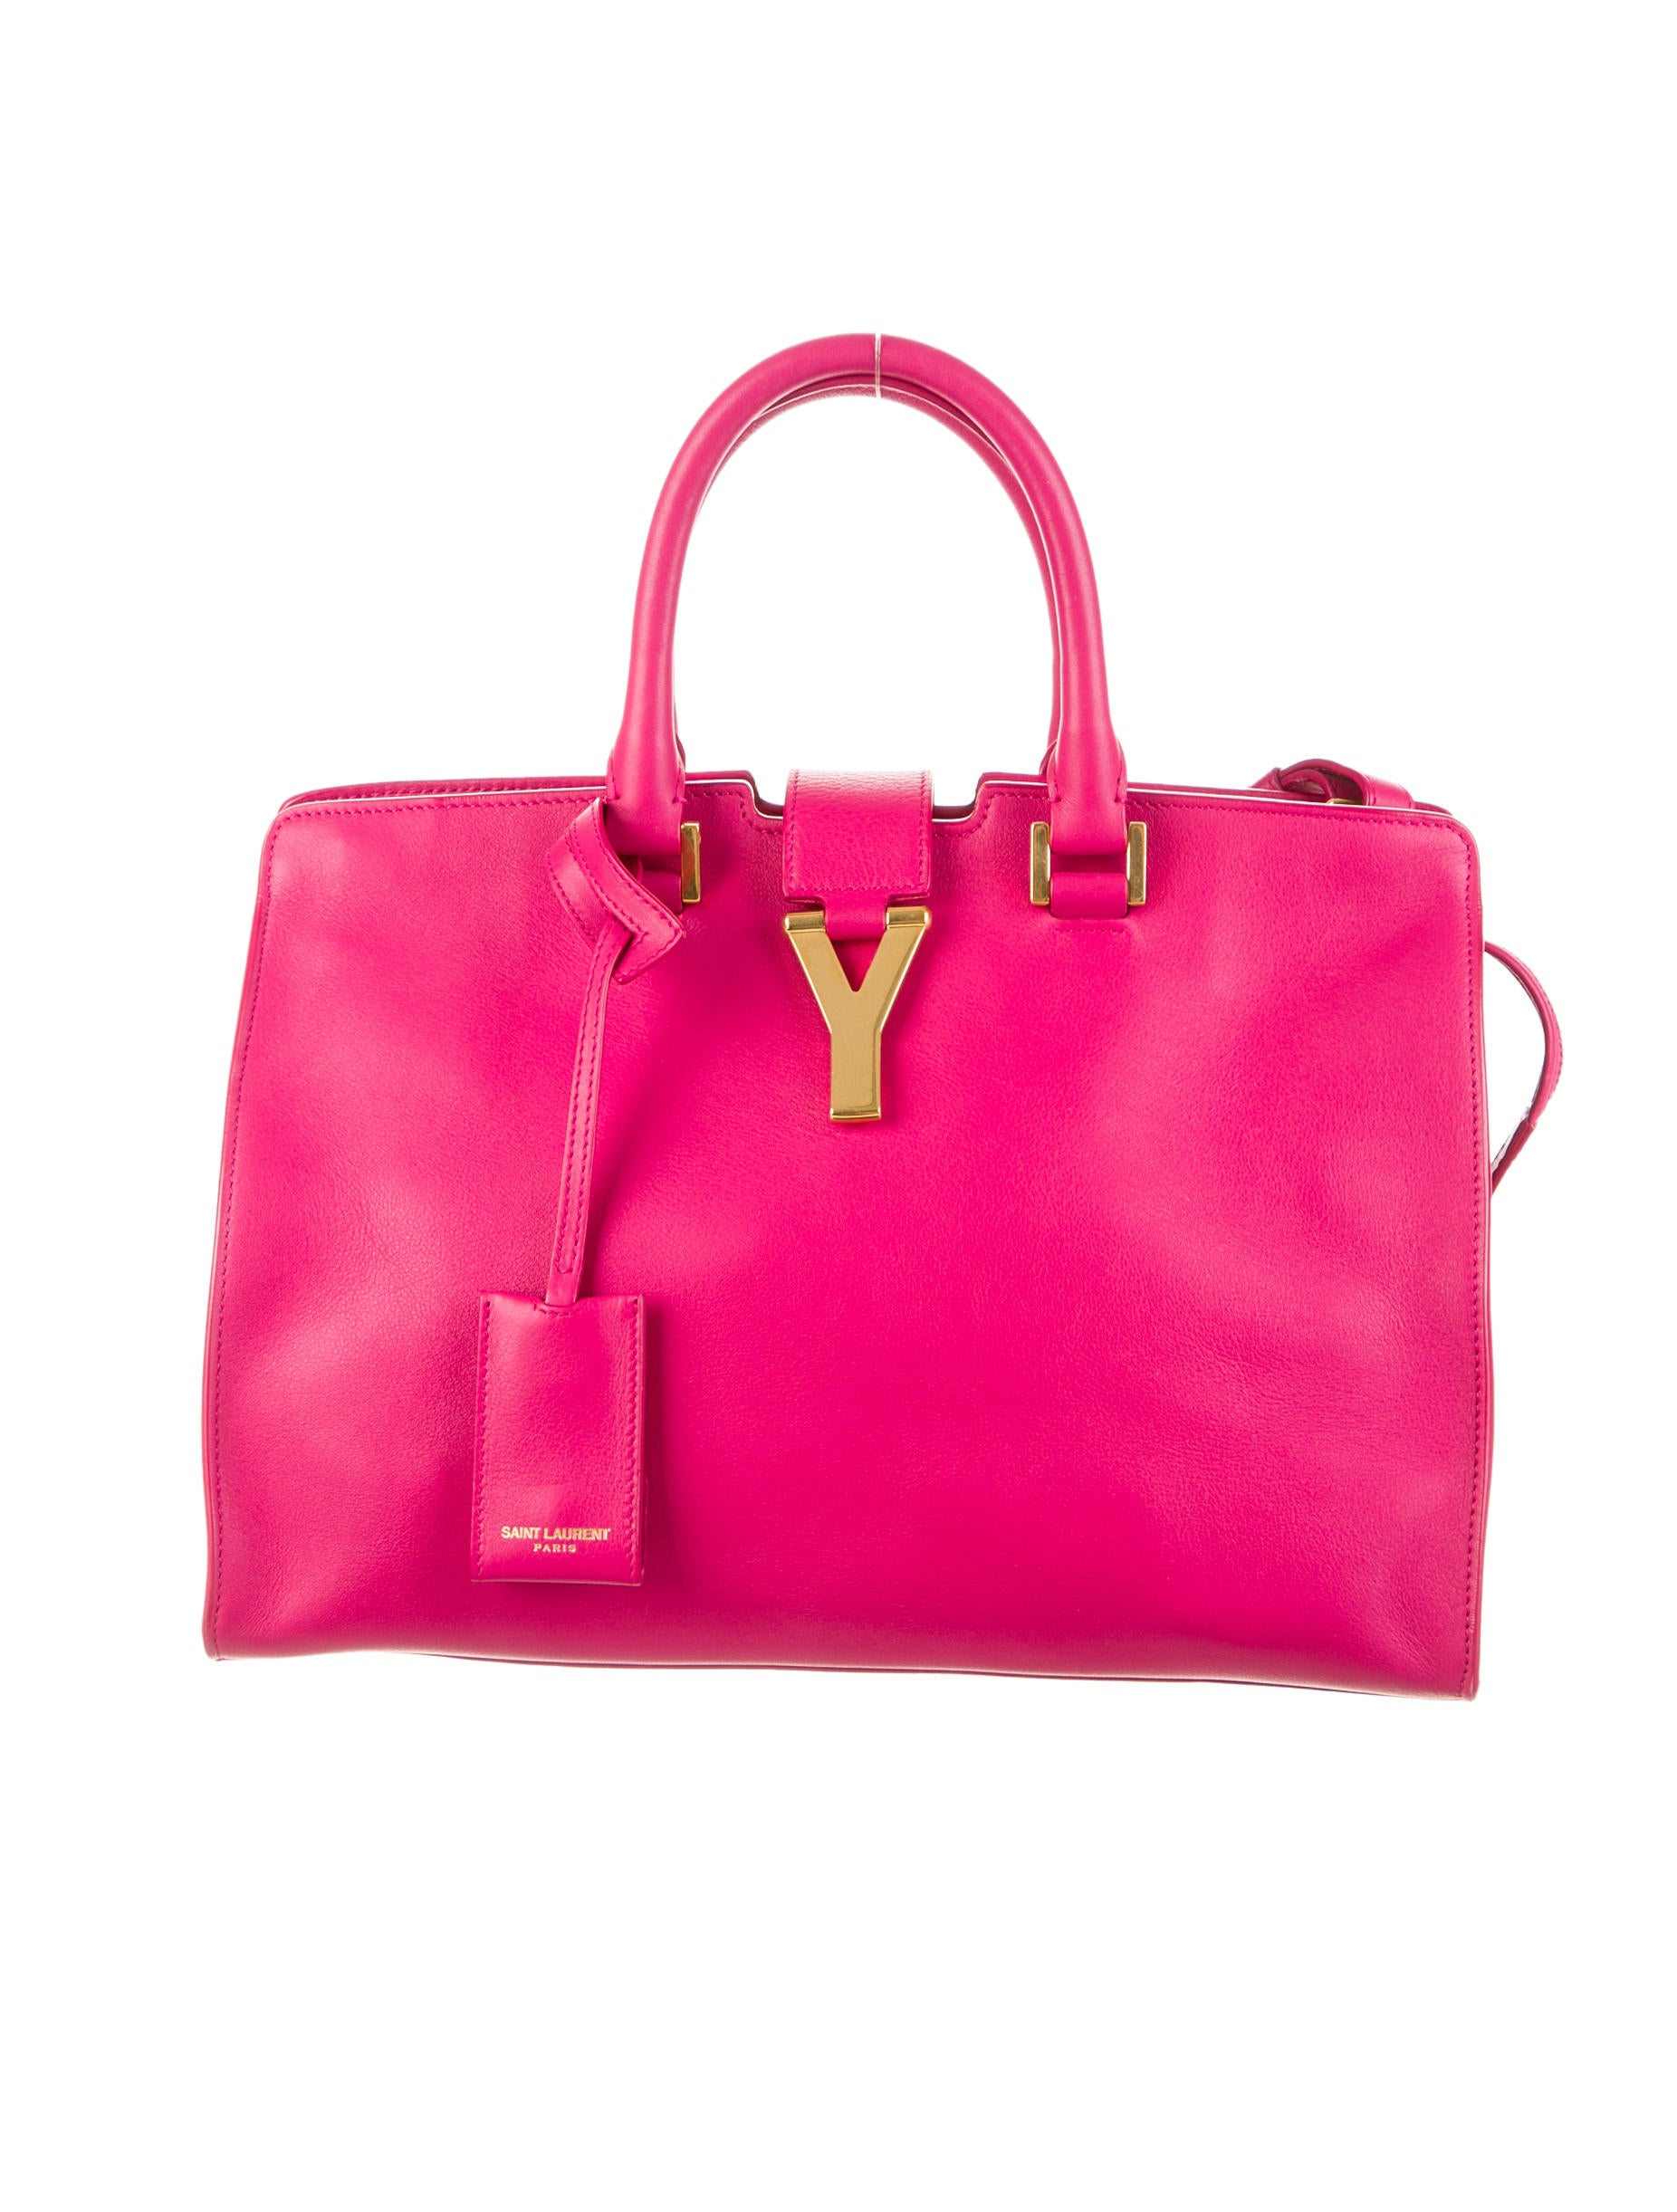 Yves Saint Laurent Mini Chyc Shoulder Bag 84